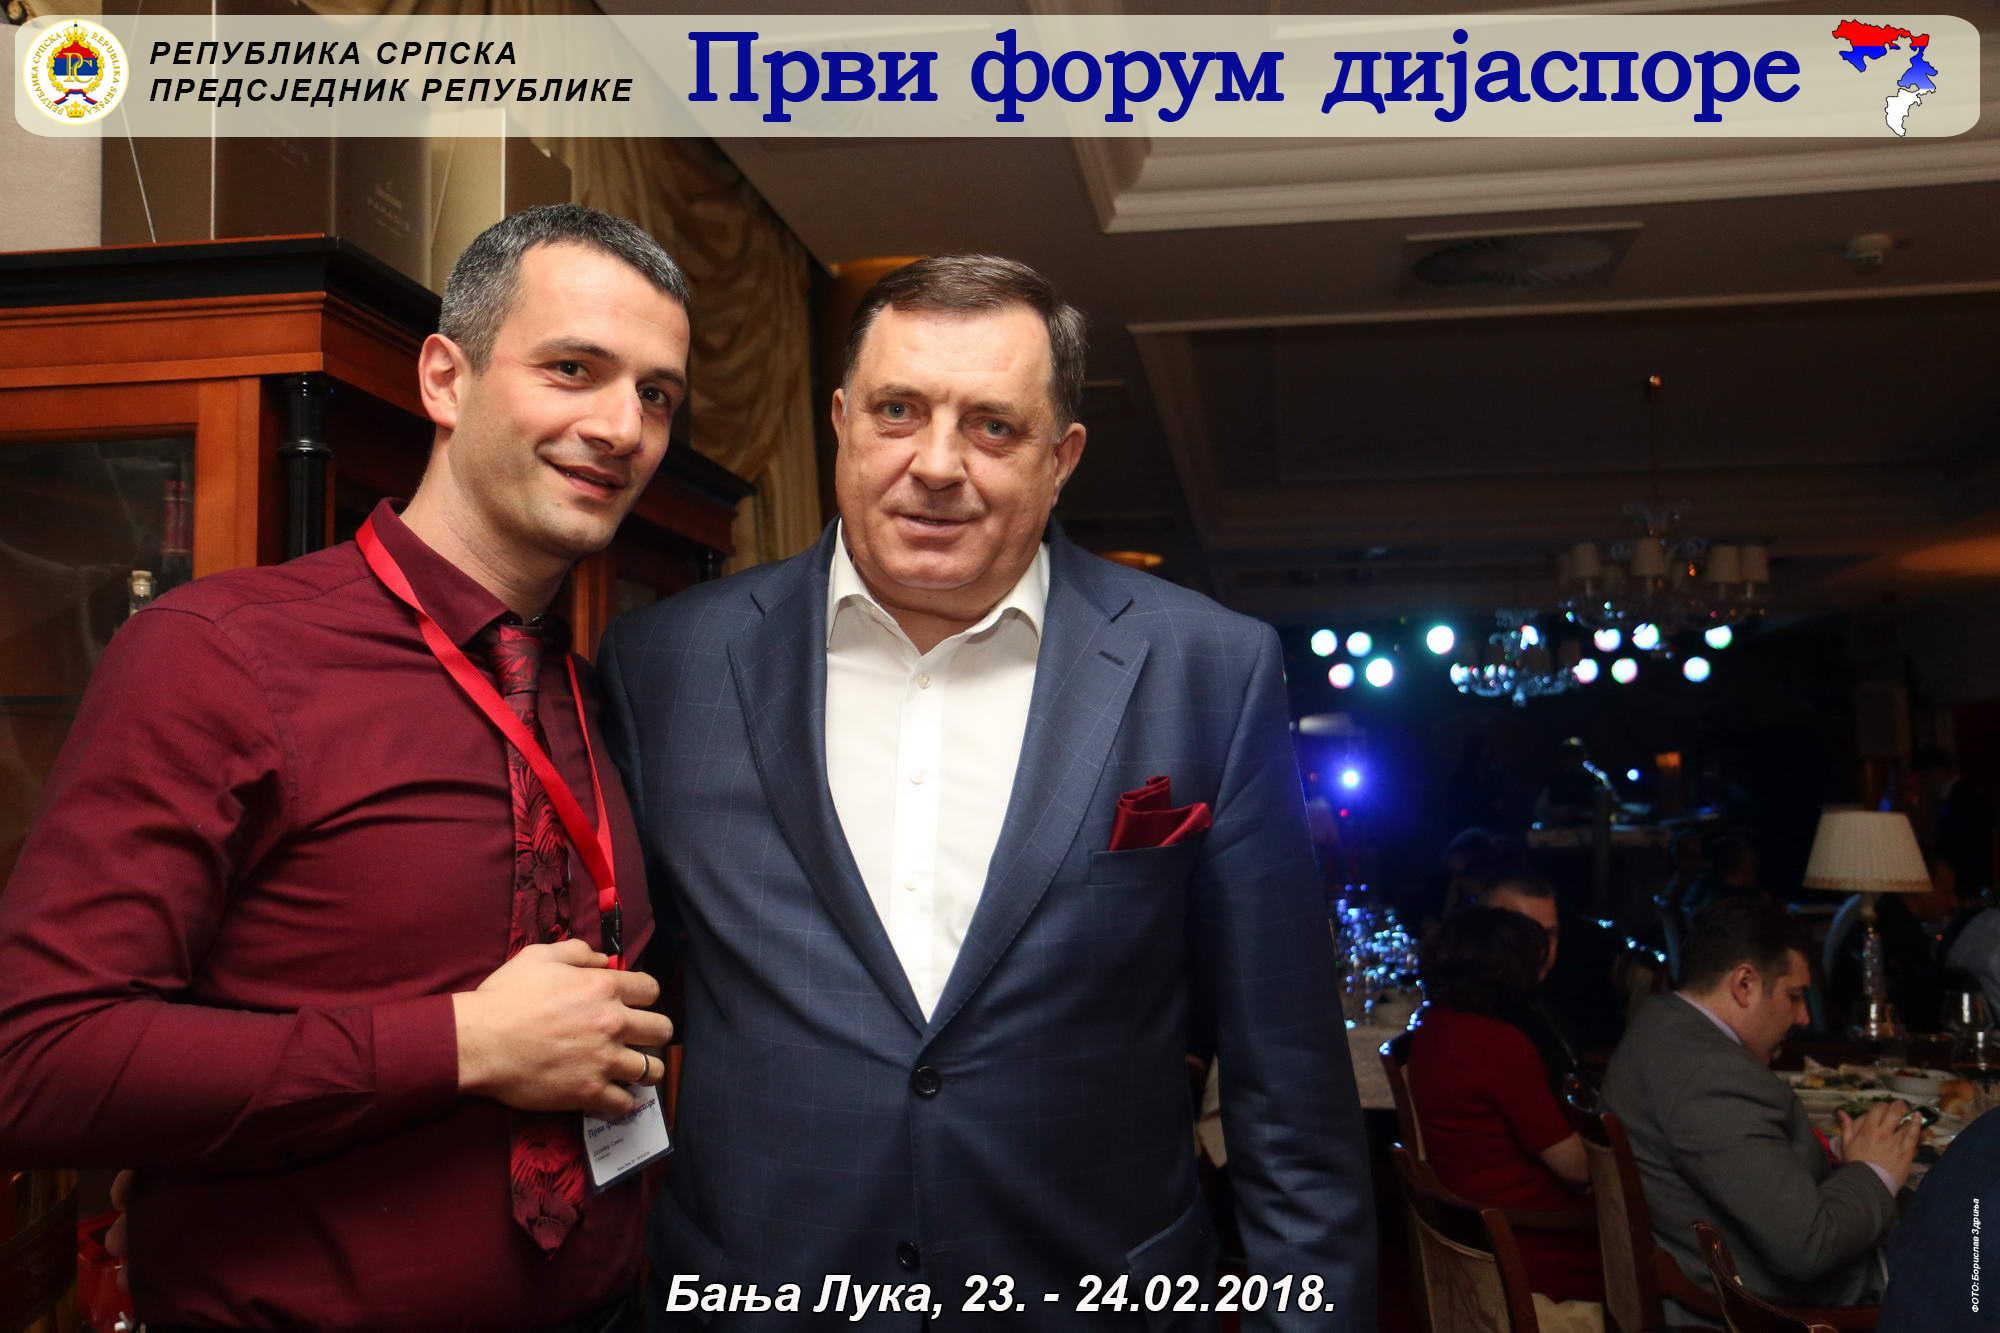 2018-02-23-i-24_prvi-forum-dijaspore_180_zipaphoto_borislav-zdrinja